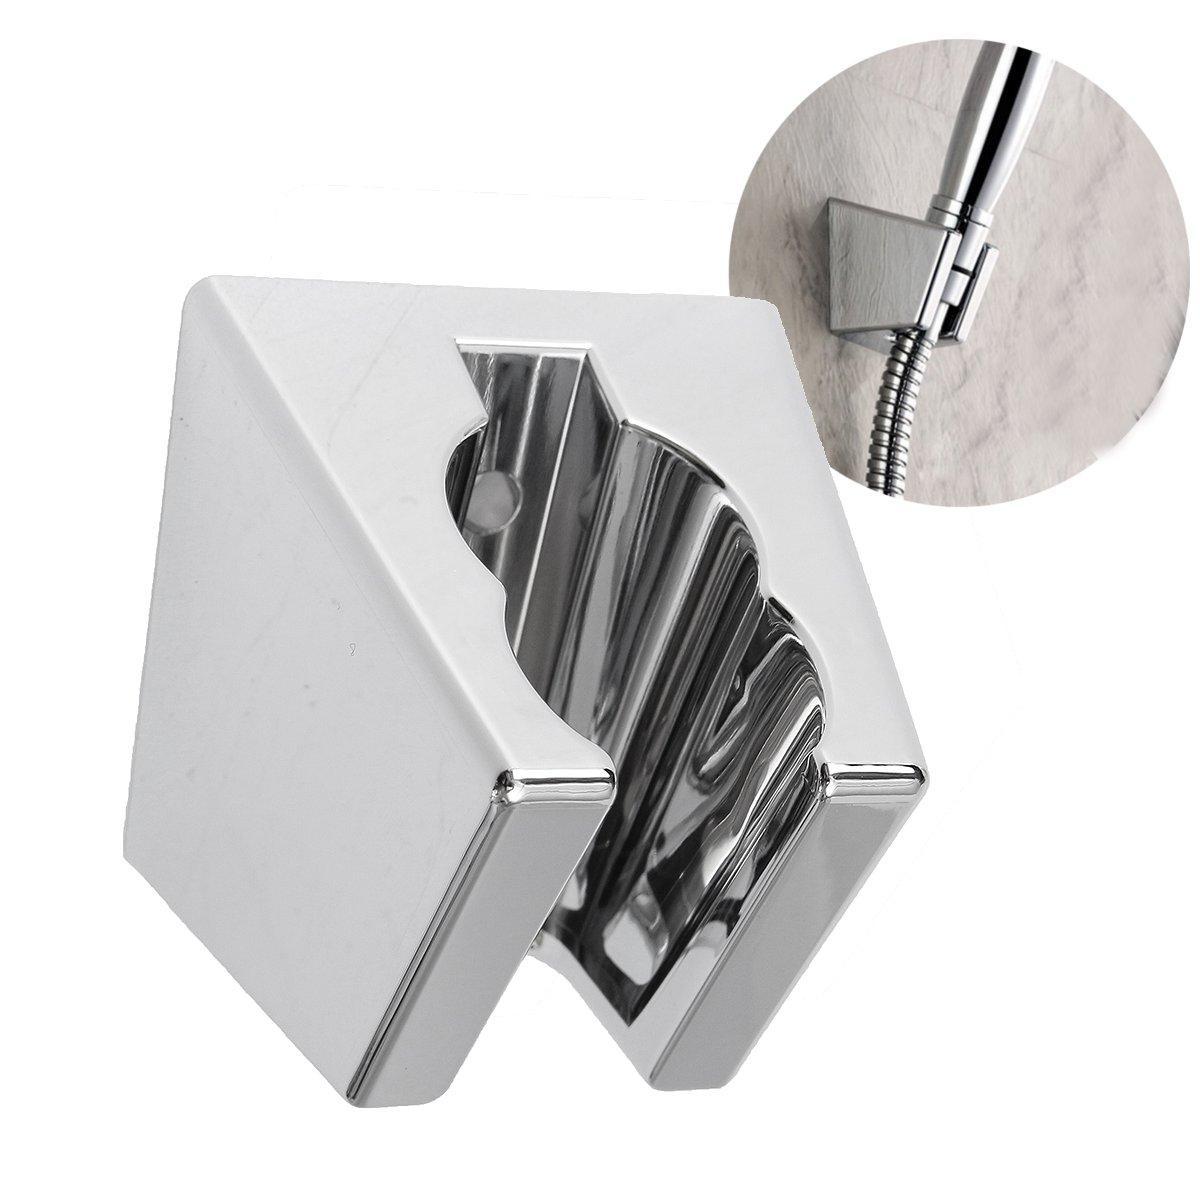 Universal Bathroom Wall Mount Shower Bracket Holder For Handheld Shower Head